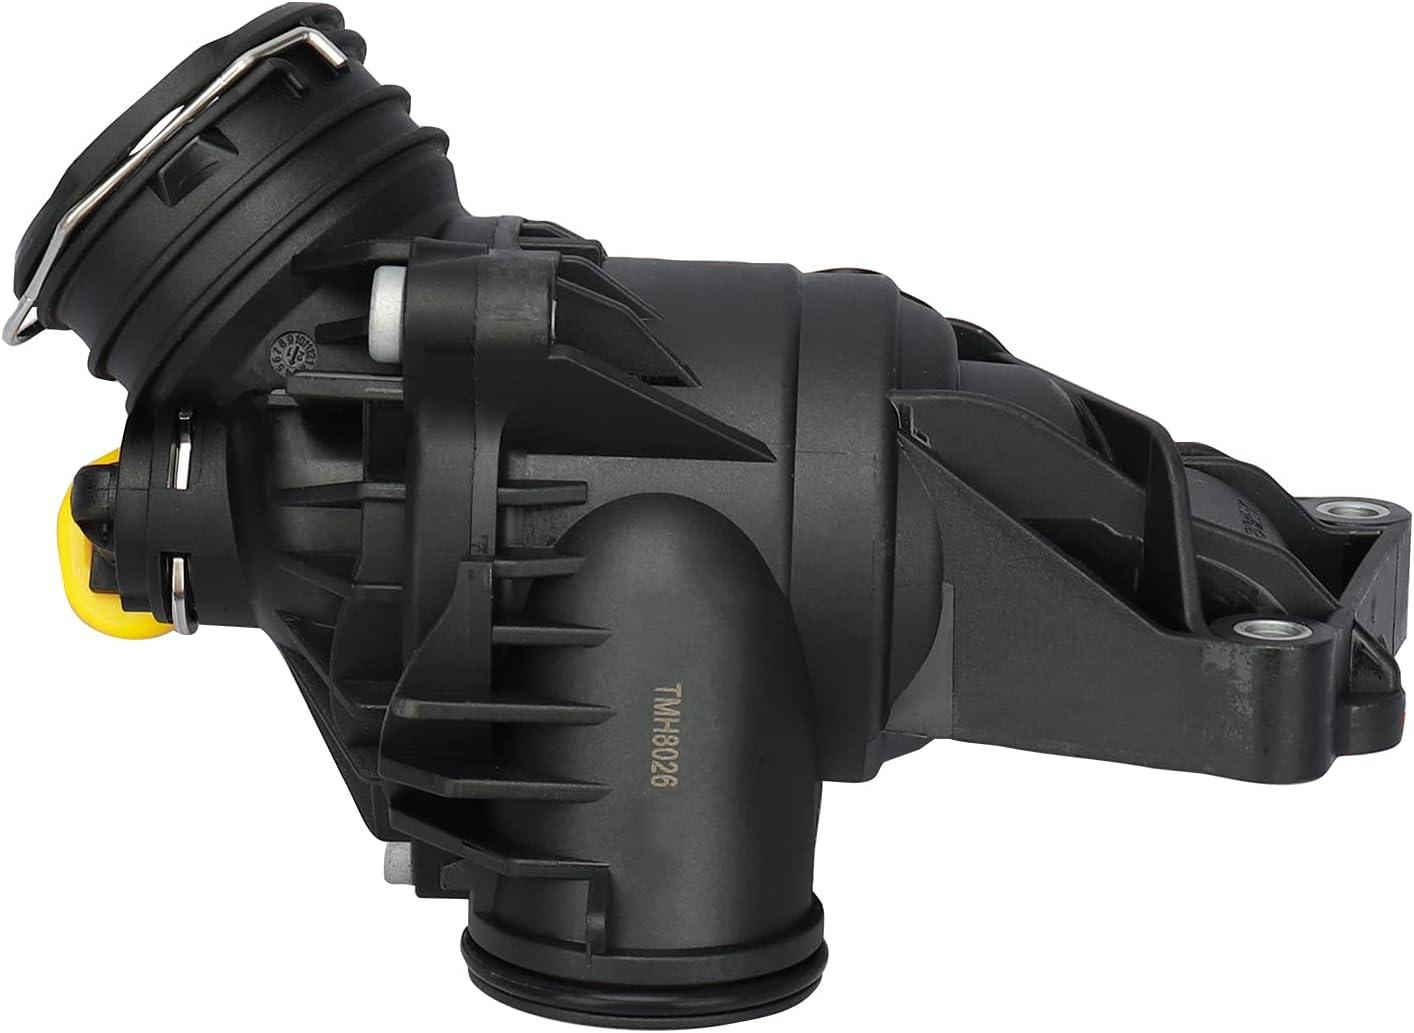 Large-scale sale HARUMA 2762000515 Engine Coolant fo Thermostat Housing Quantity limited 2012-2018